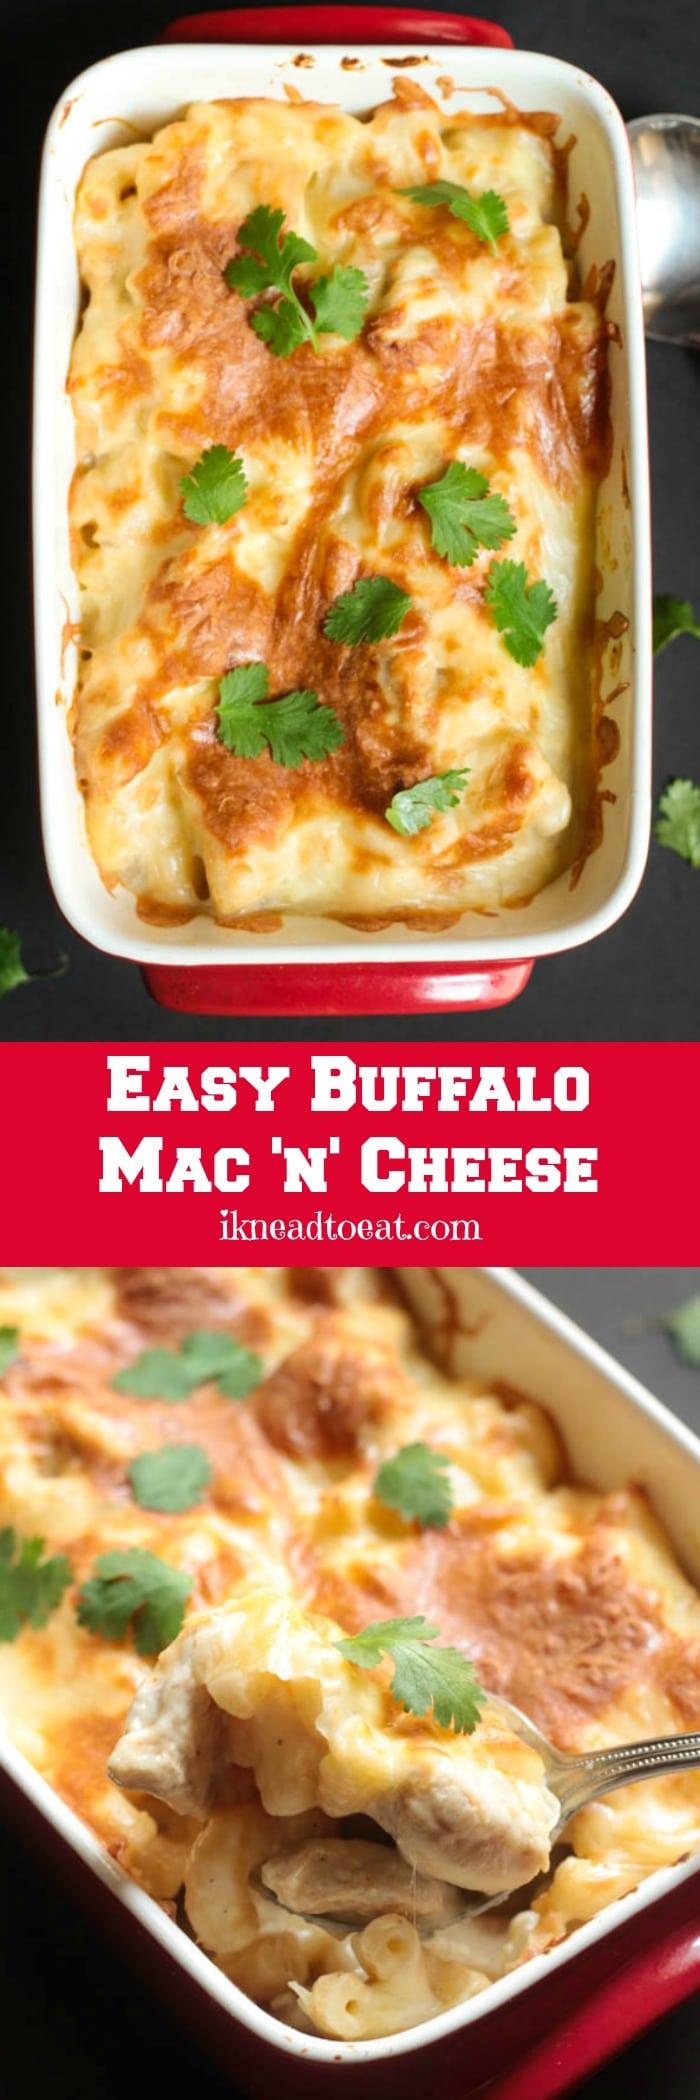 Easy Buffalo Mac n Cheese